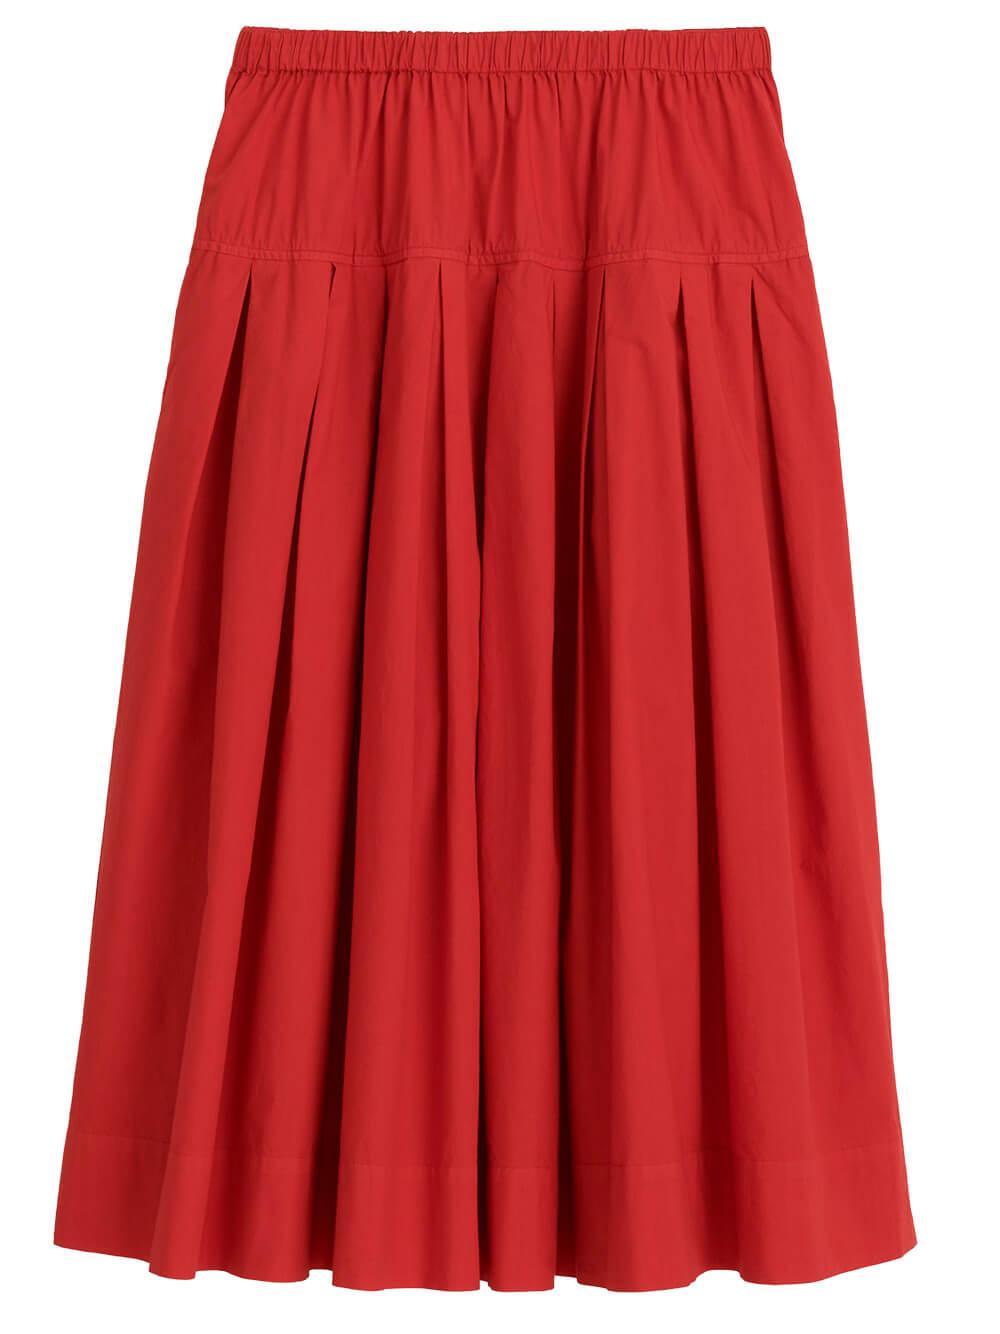 Pull- On Skirt Item # 206-WB001-2156-F21